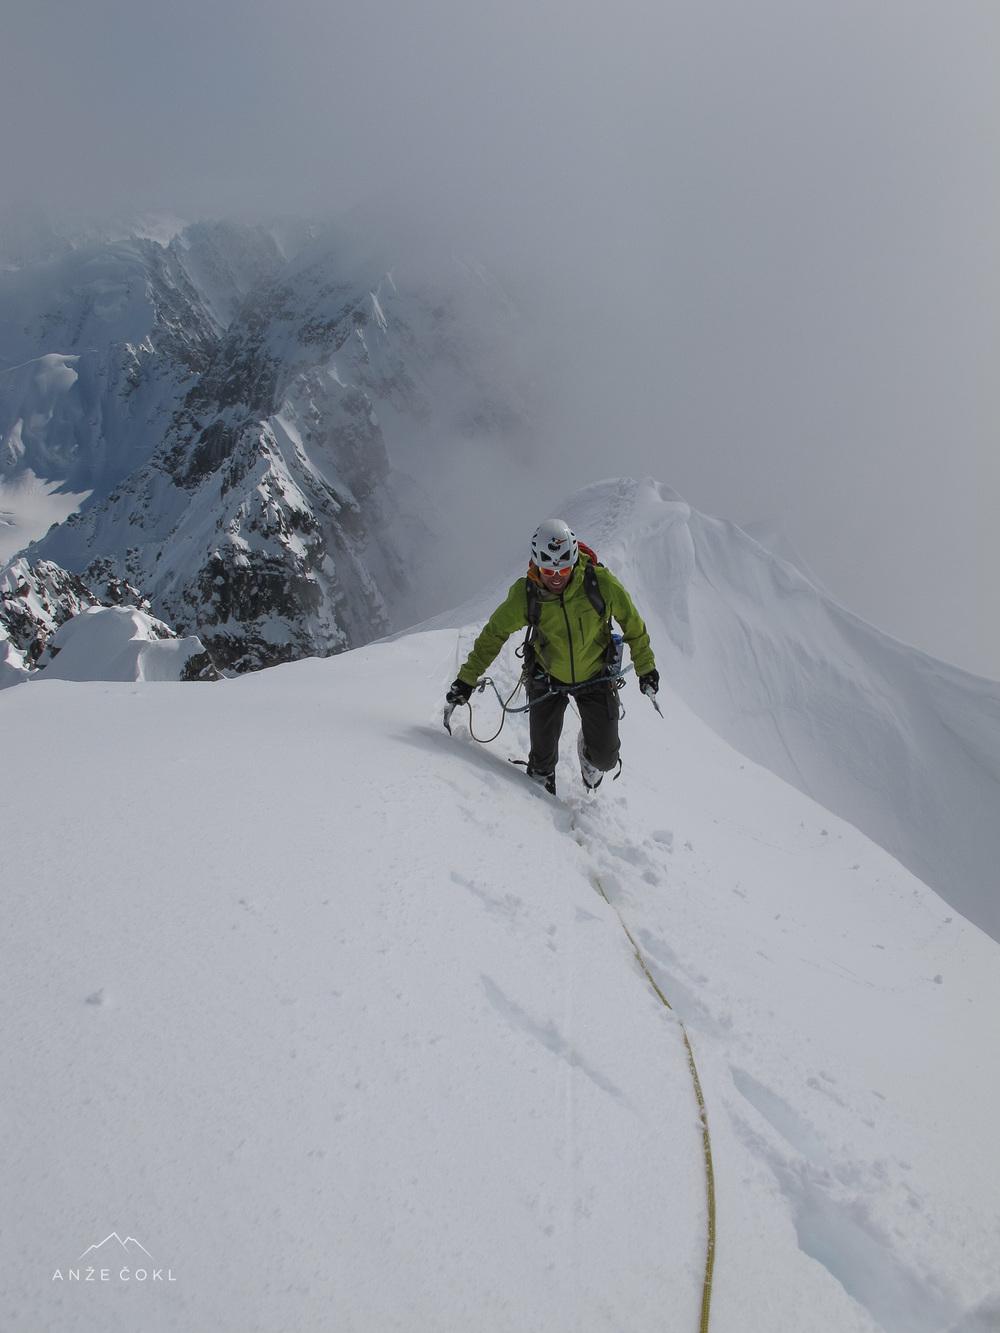 Zadnji metri pod novim neosvojenim vrhom. Foto: Grega Ažman